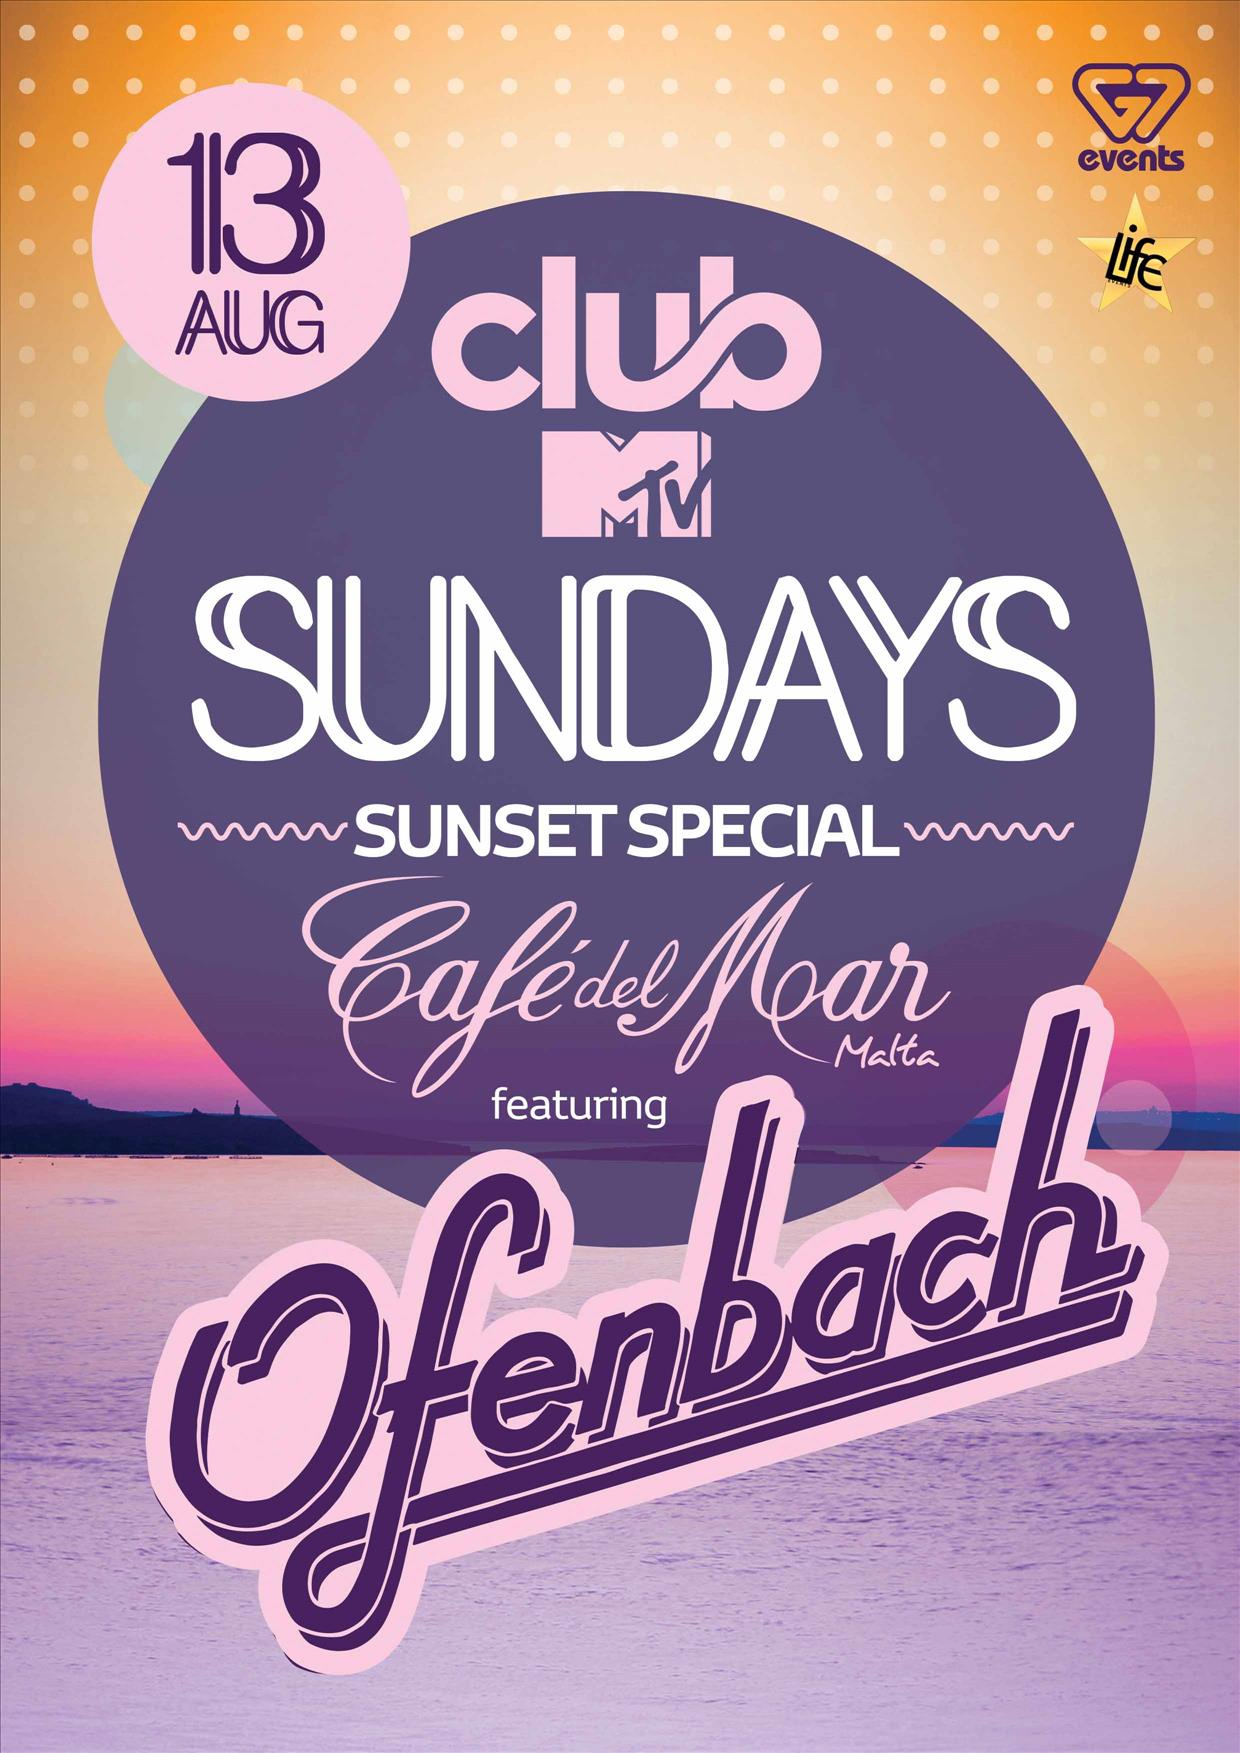 Club MTV Sundays present OFENBACH flyer